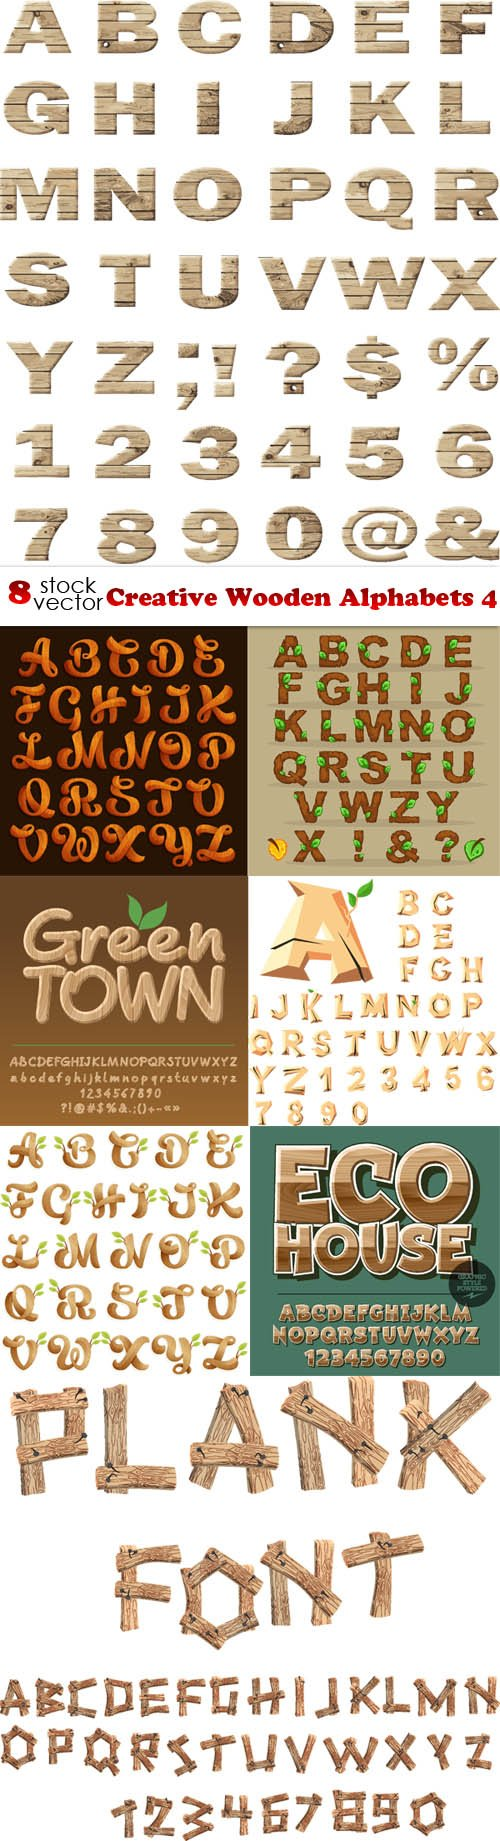 Vectors - Creative Wooden Alphabets 4